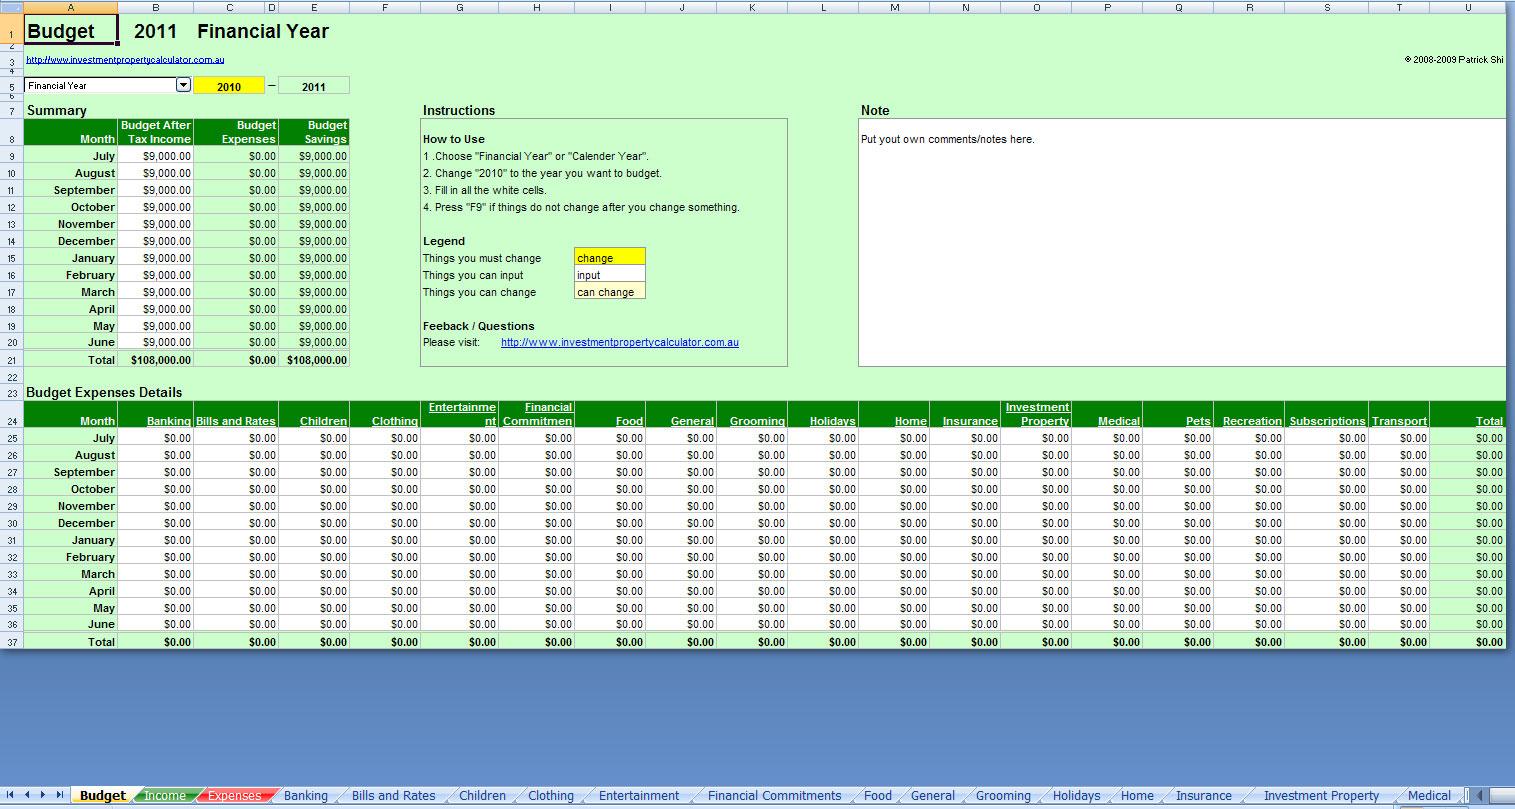 Investment Property Spreadsheet Excel Inside Free Comprehensive Budget Planner Spreadsheet Excel